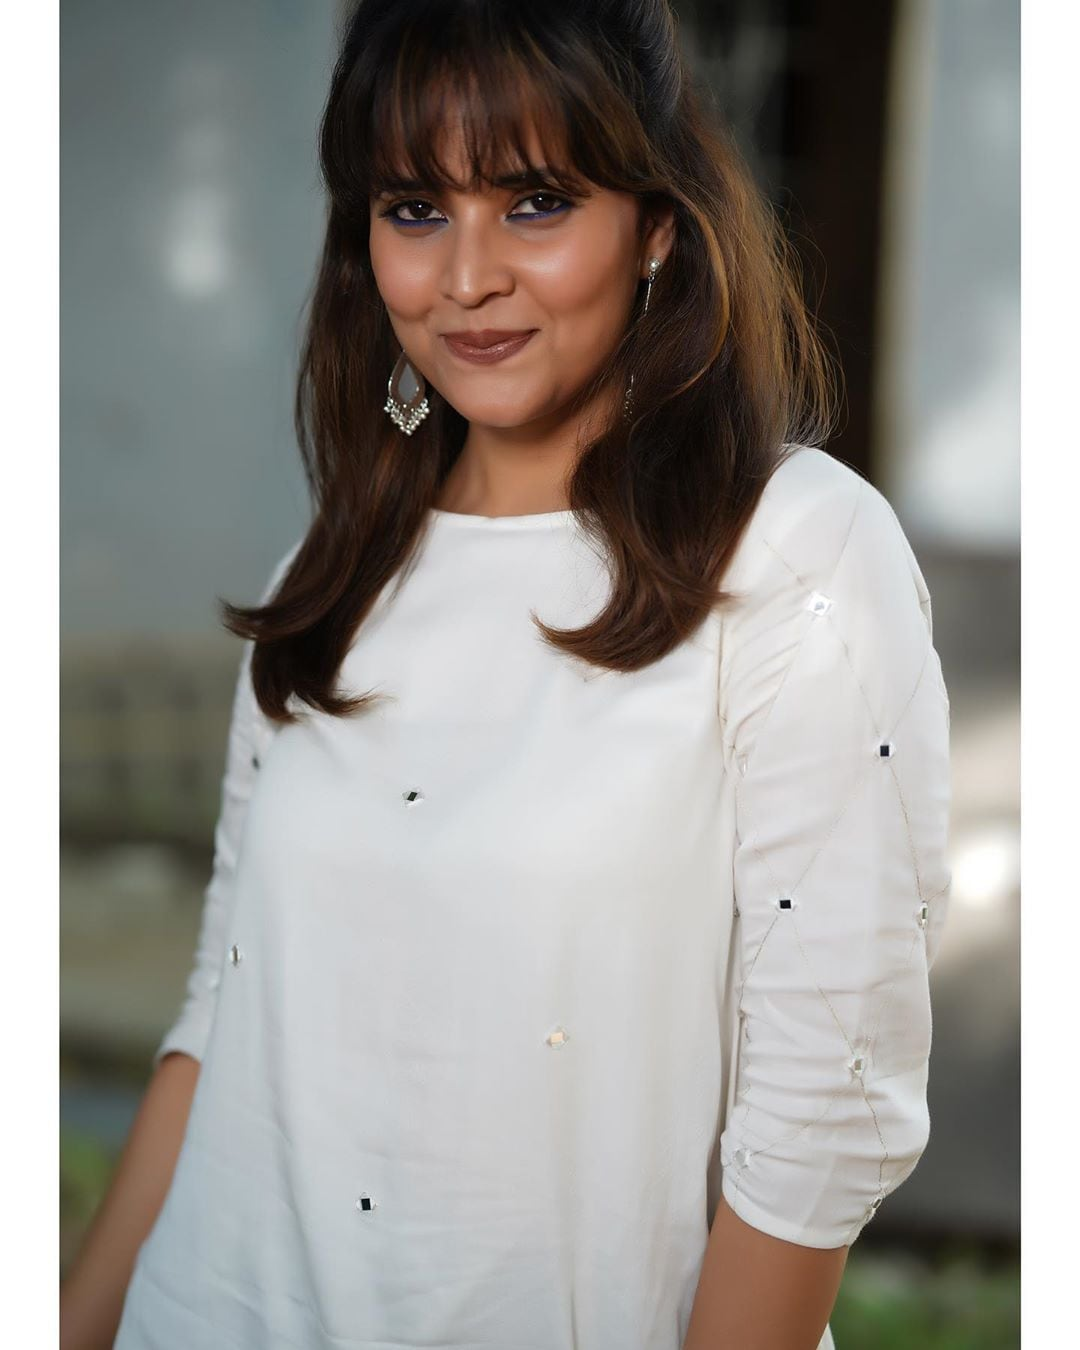 Anasuya Bharadwaj : జబర్దస్త్ భామ అనసూయ లేటెస్ట్ పిక్స్.. Photo : Instagram